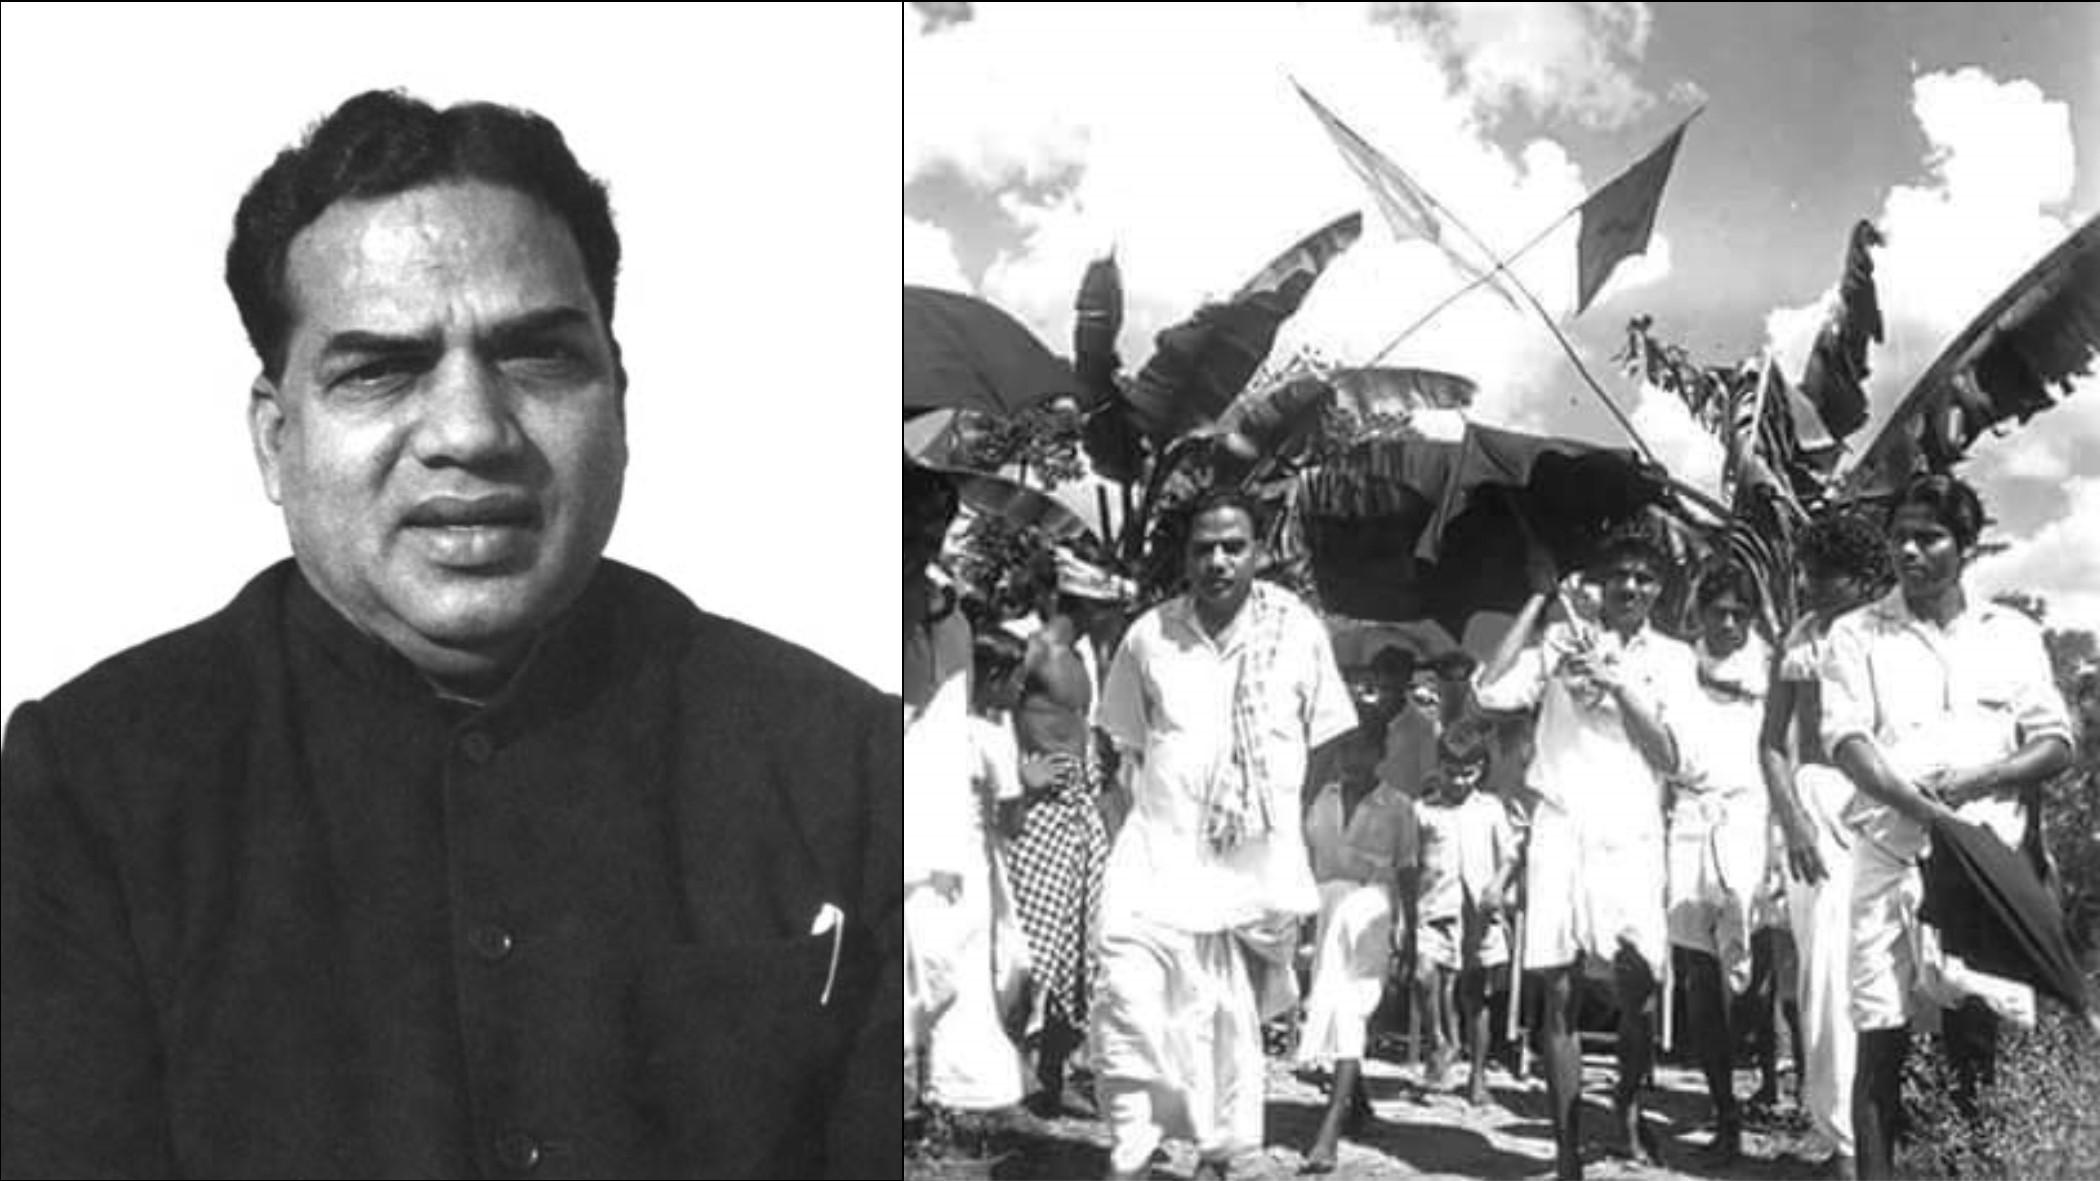 Balram's post reveals how rotten Congress has become, says Pinarayi